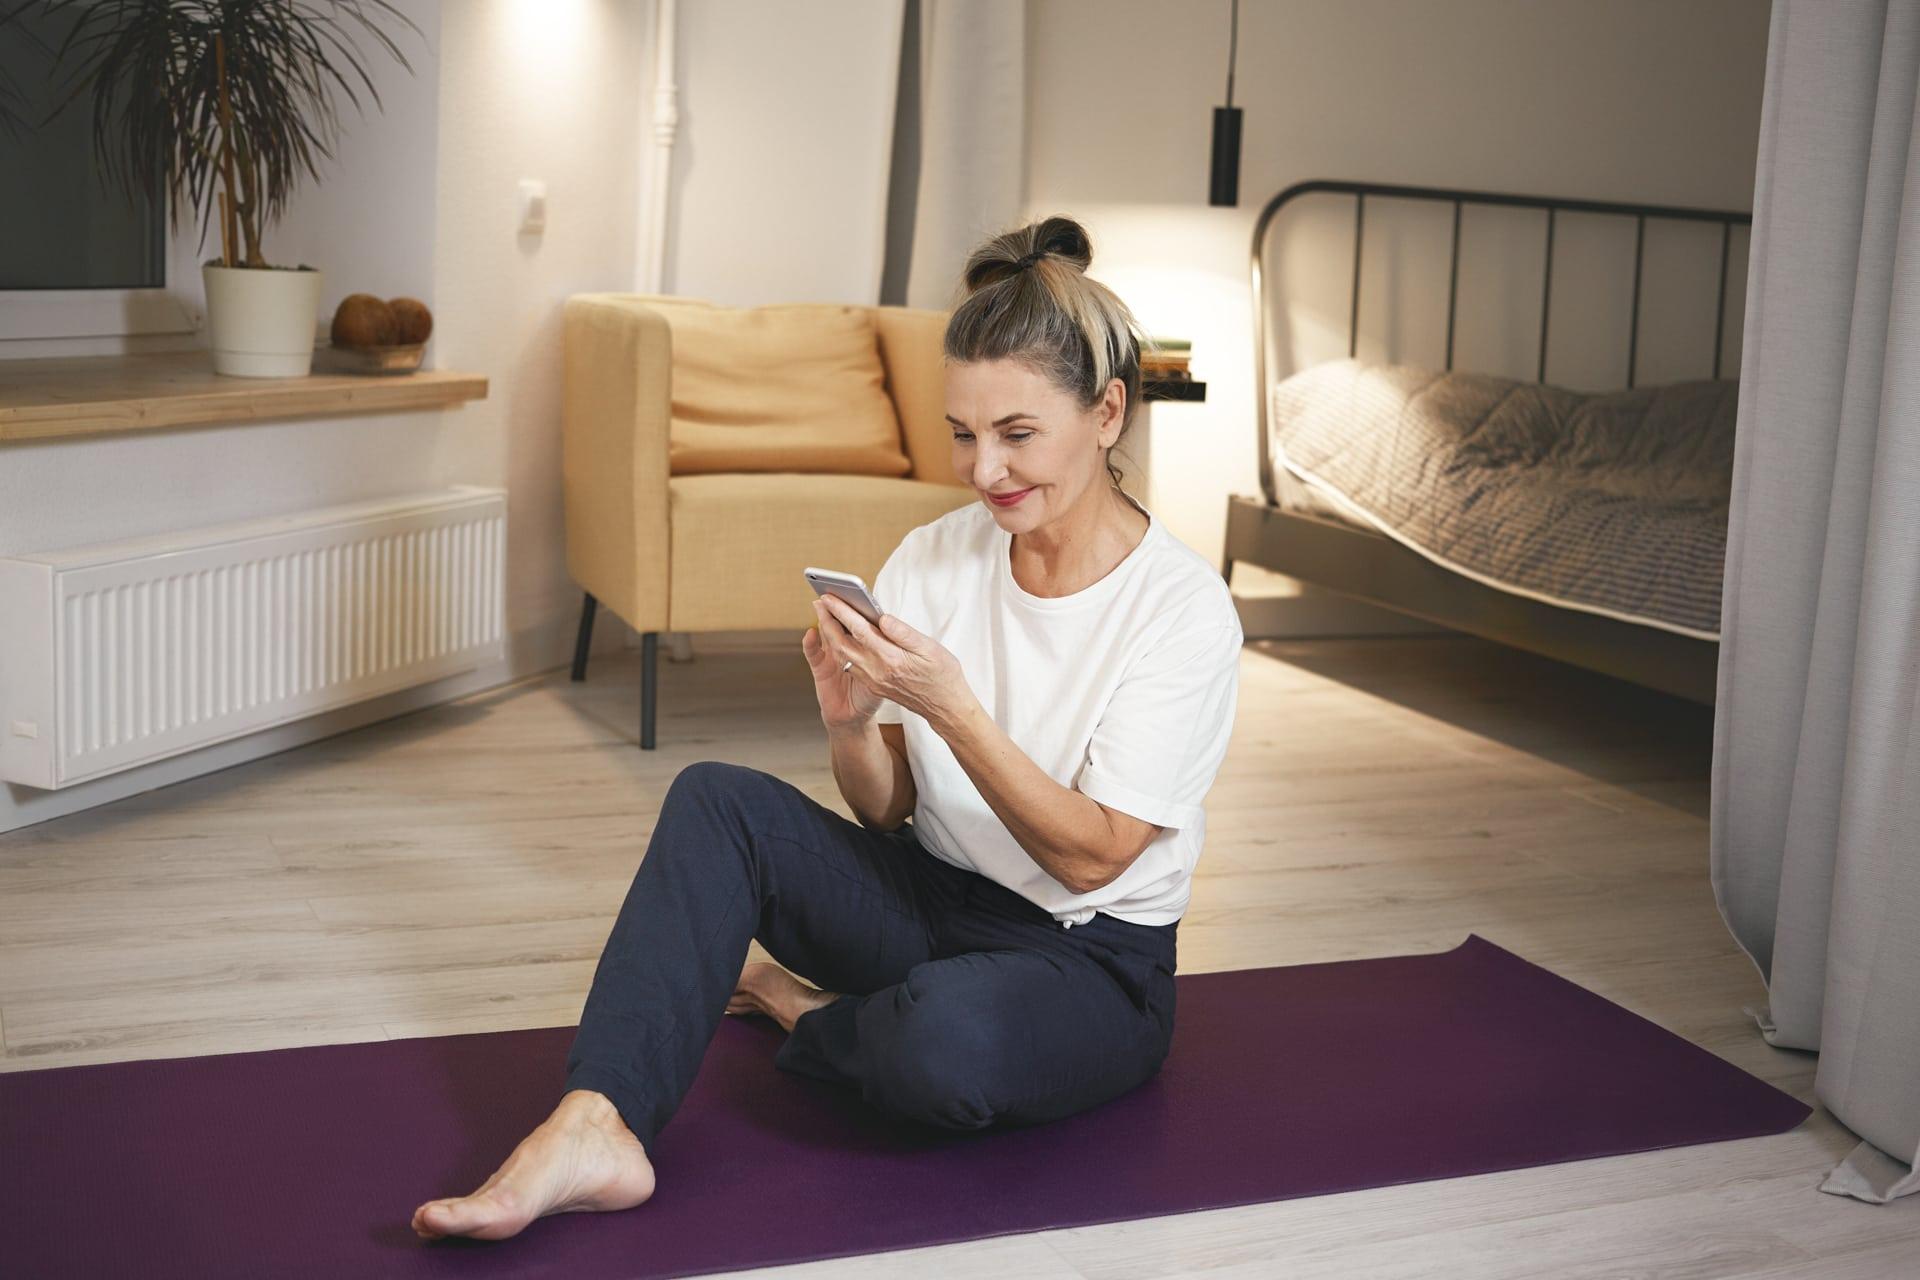 Seniorin mit Smartphone Zoom-Kurse Online Workouts Ladys 1st Frauenfitness Potsdam